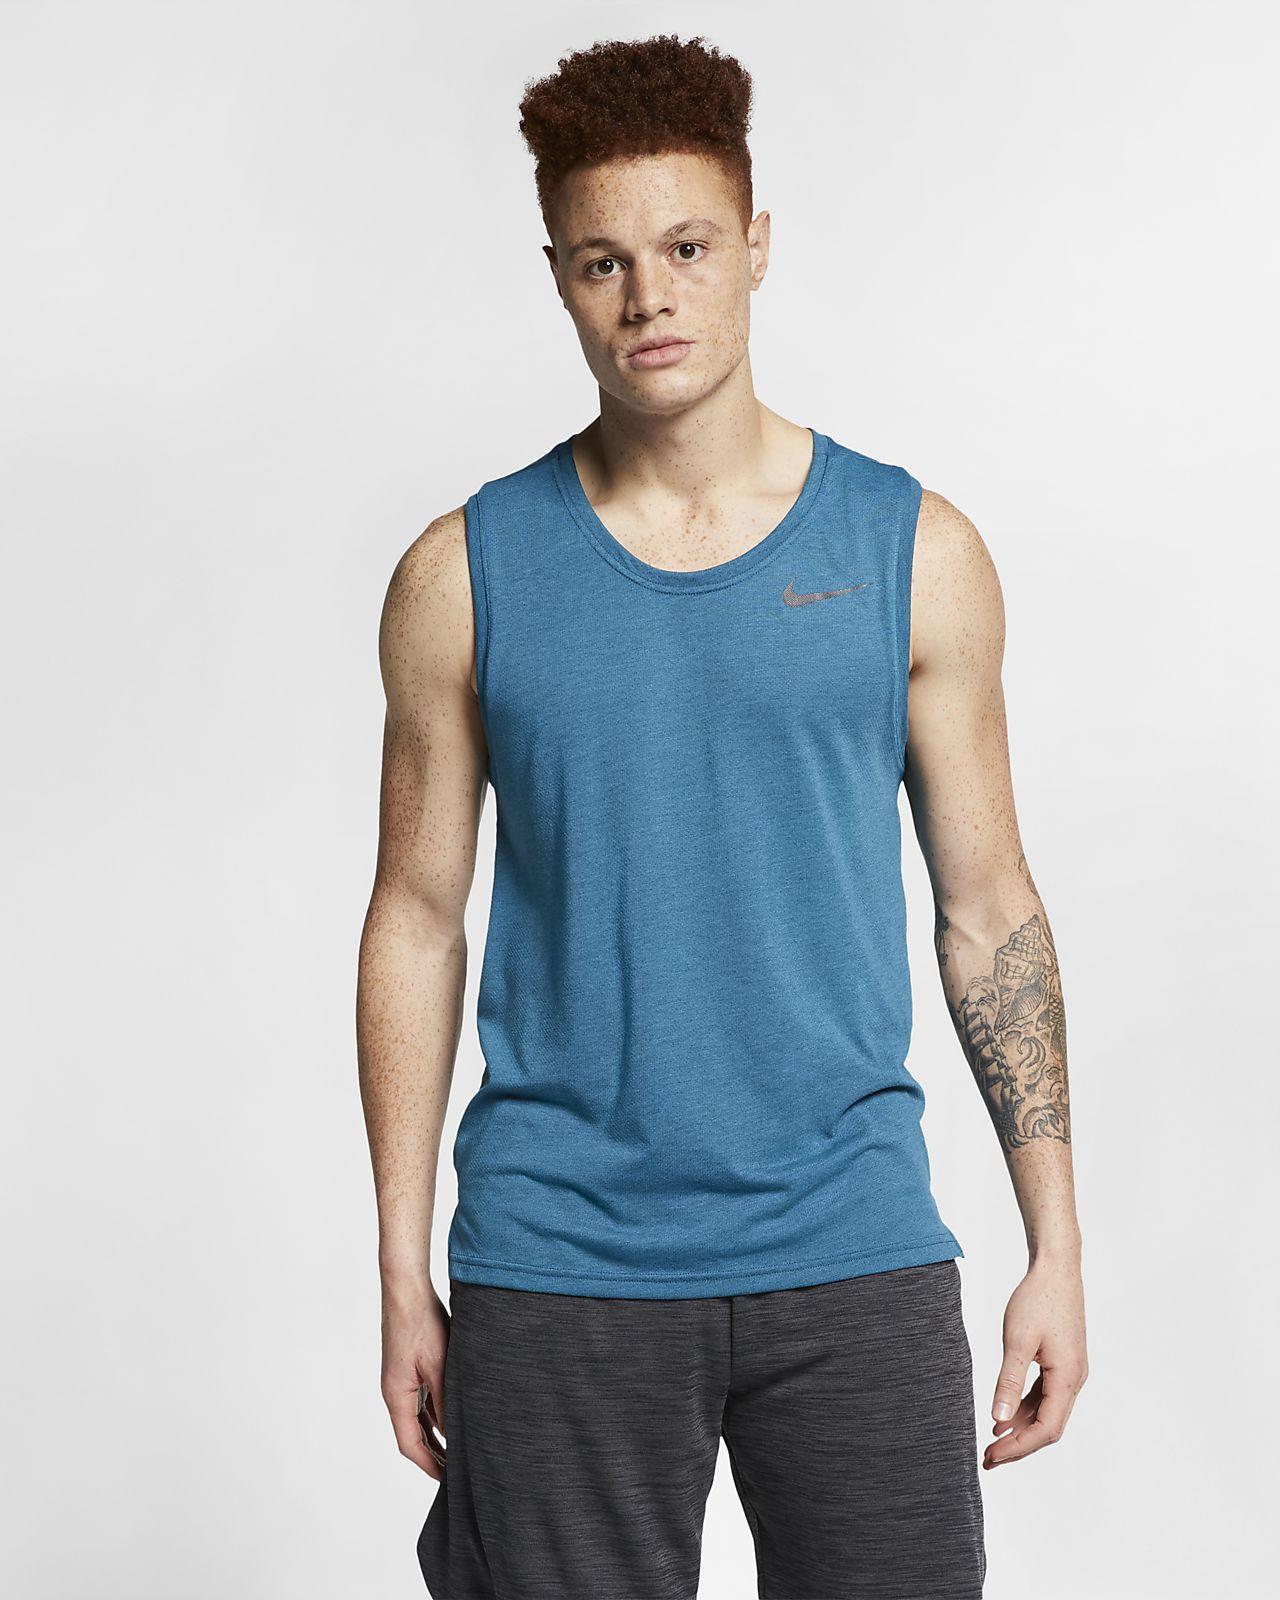 Camiseta de tirantes de entrenamiento para hombre Nike Breathe